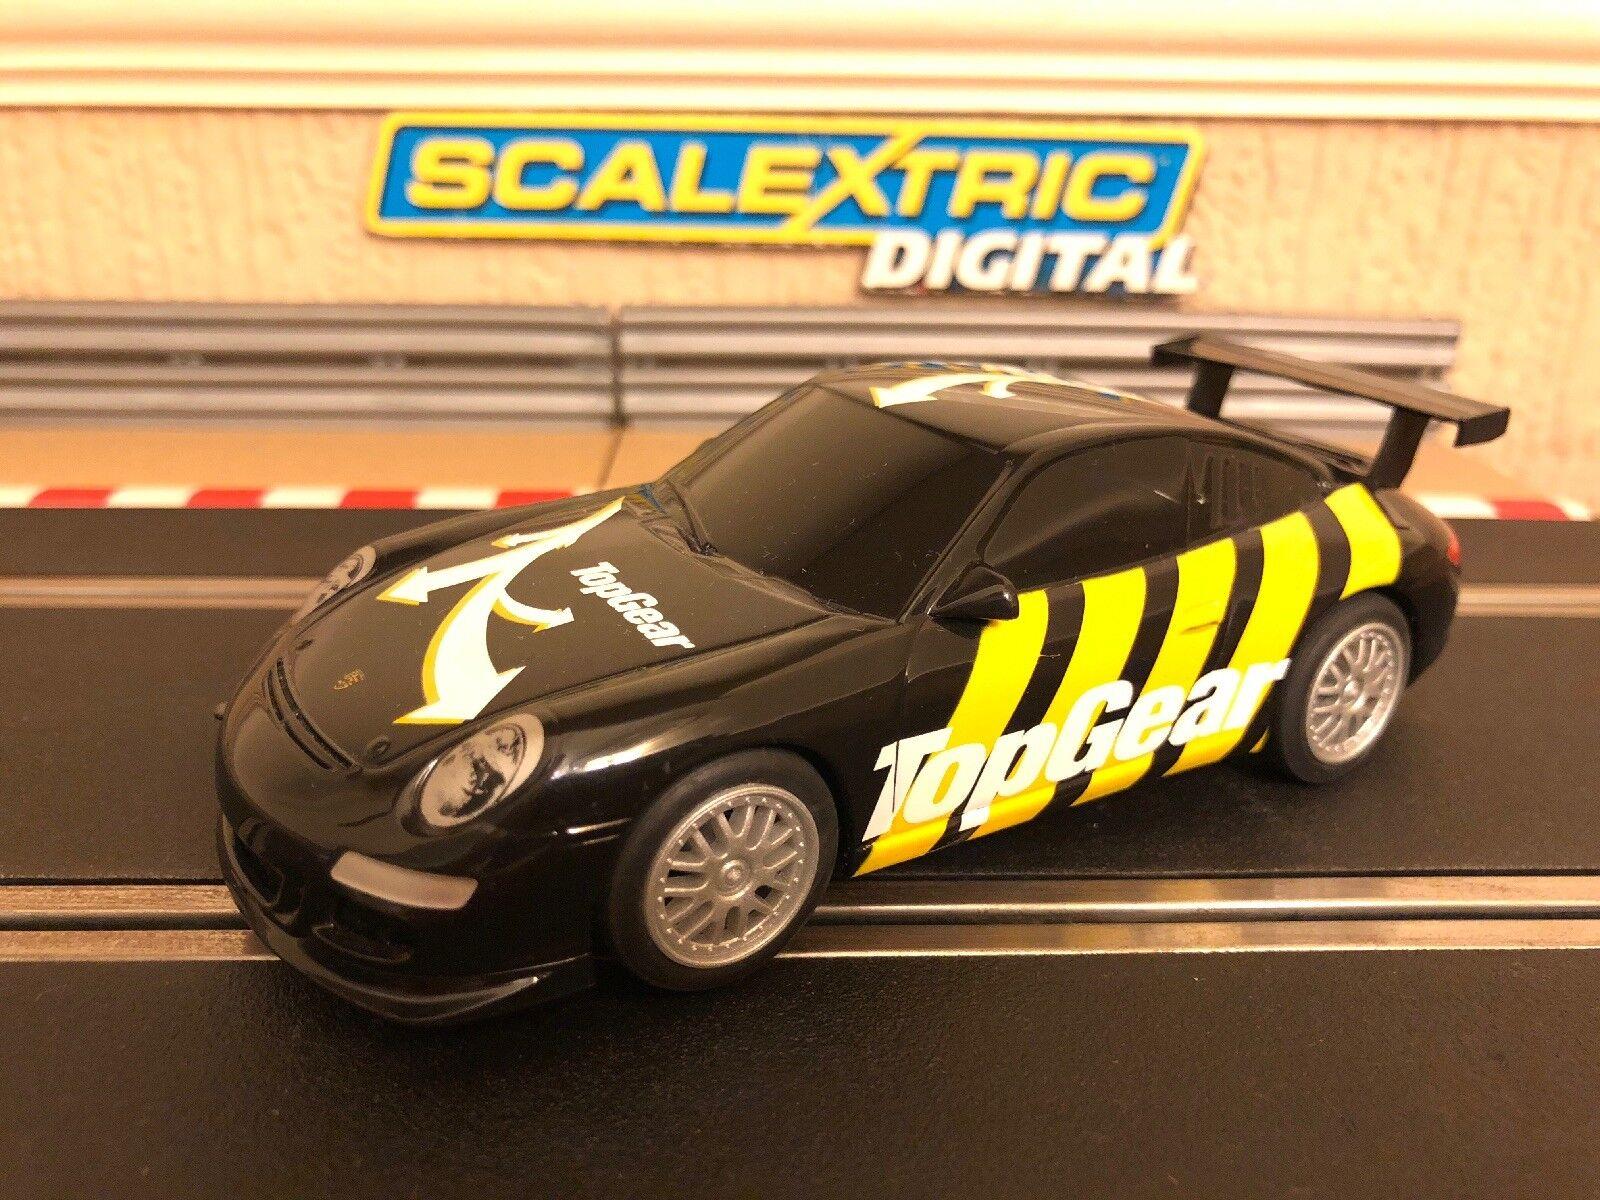 Scalextric Digital Porsche 997 Top Gear C3071 Mint Condition